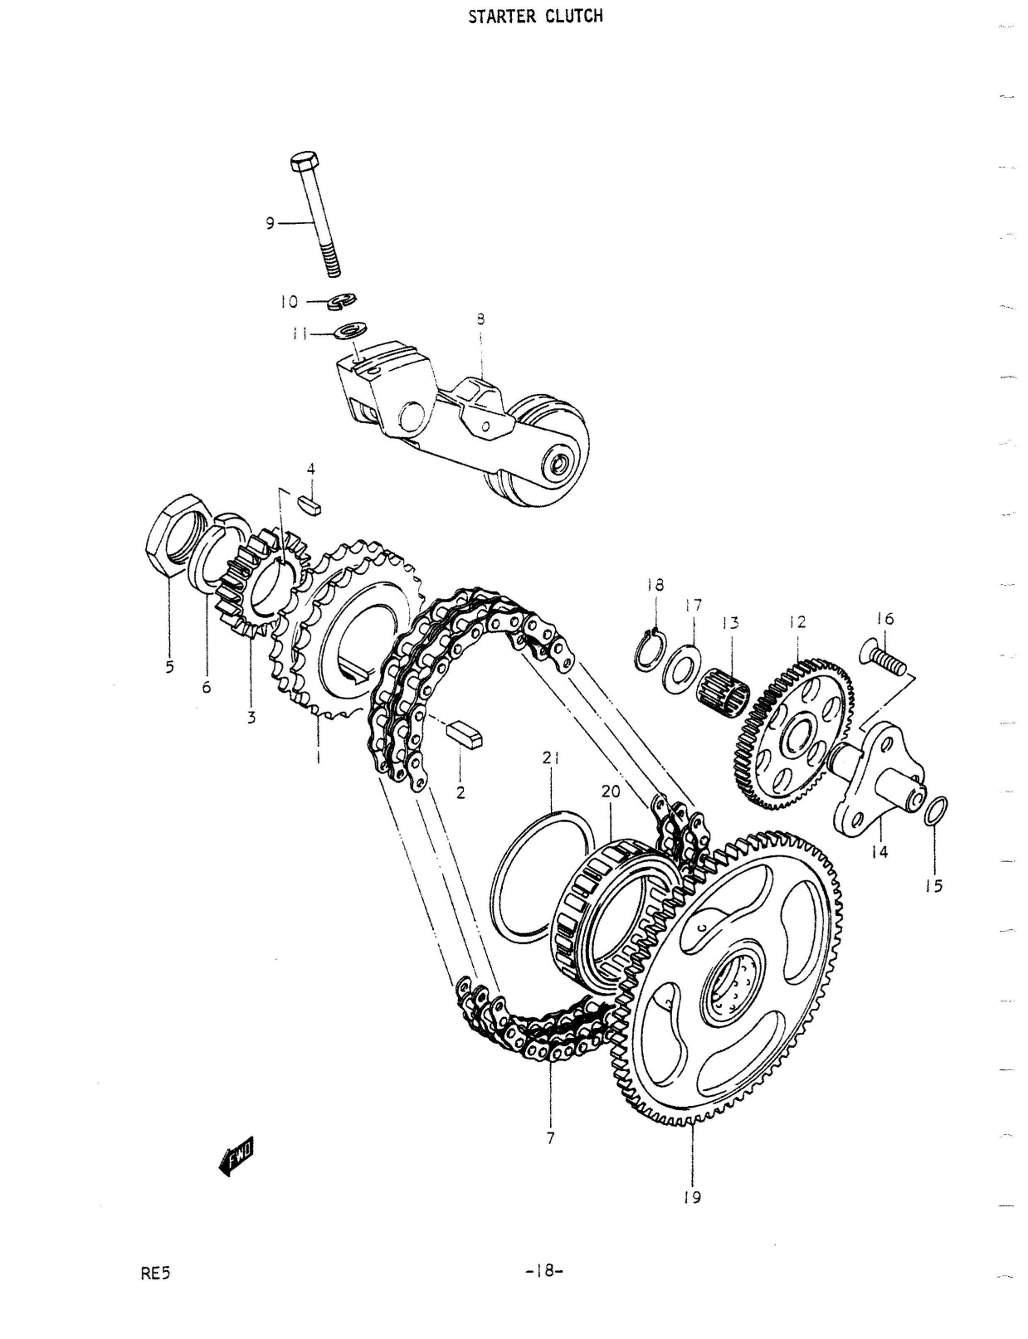 RE5 Parts Manual